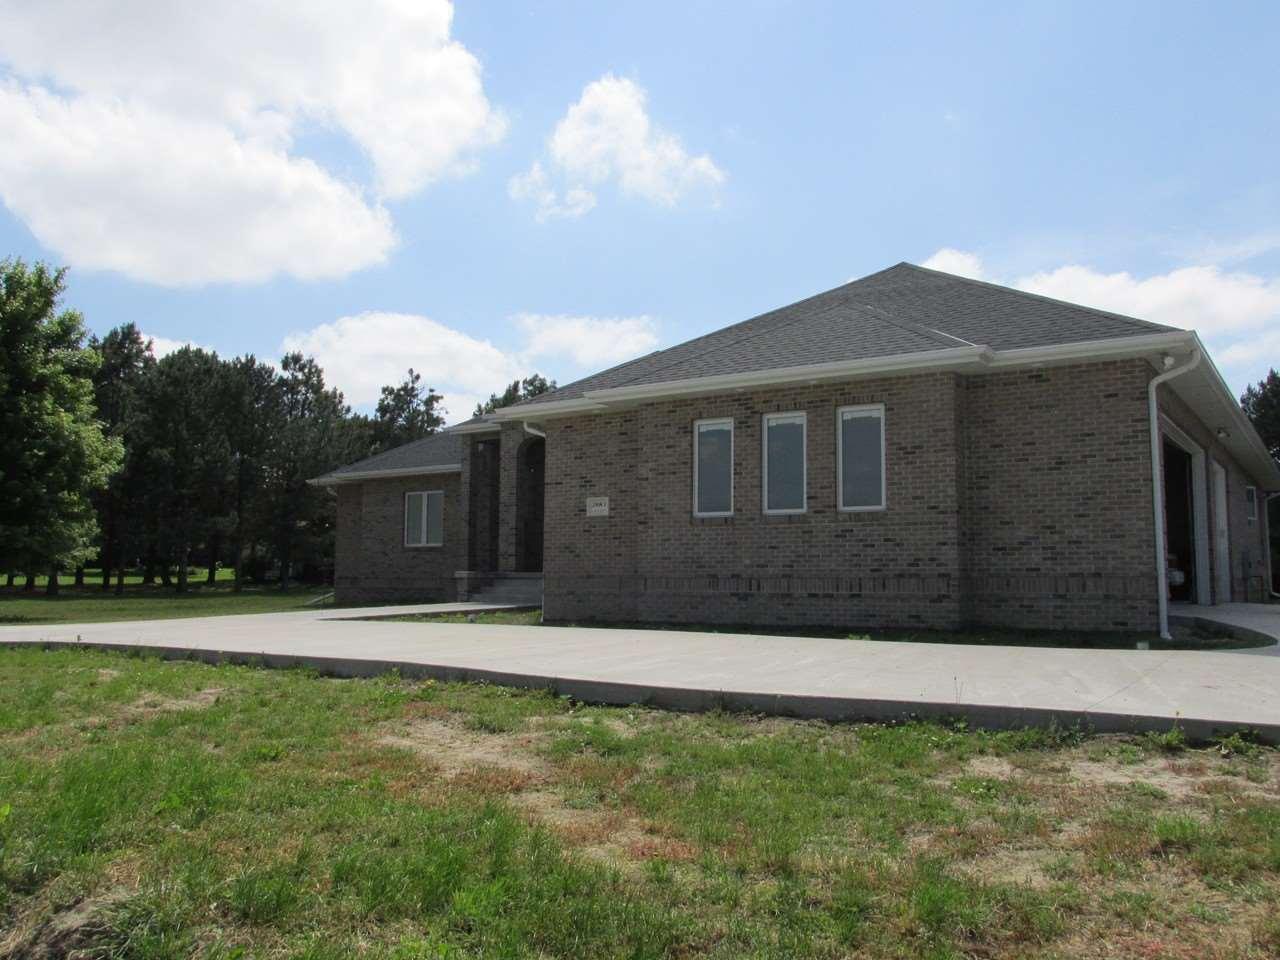 Real Estate for Sale, ListingId: 33661250, Hastings,NE68901